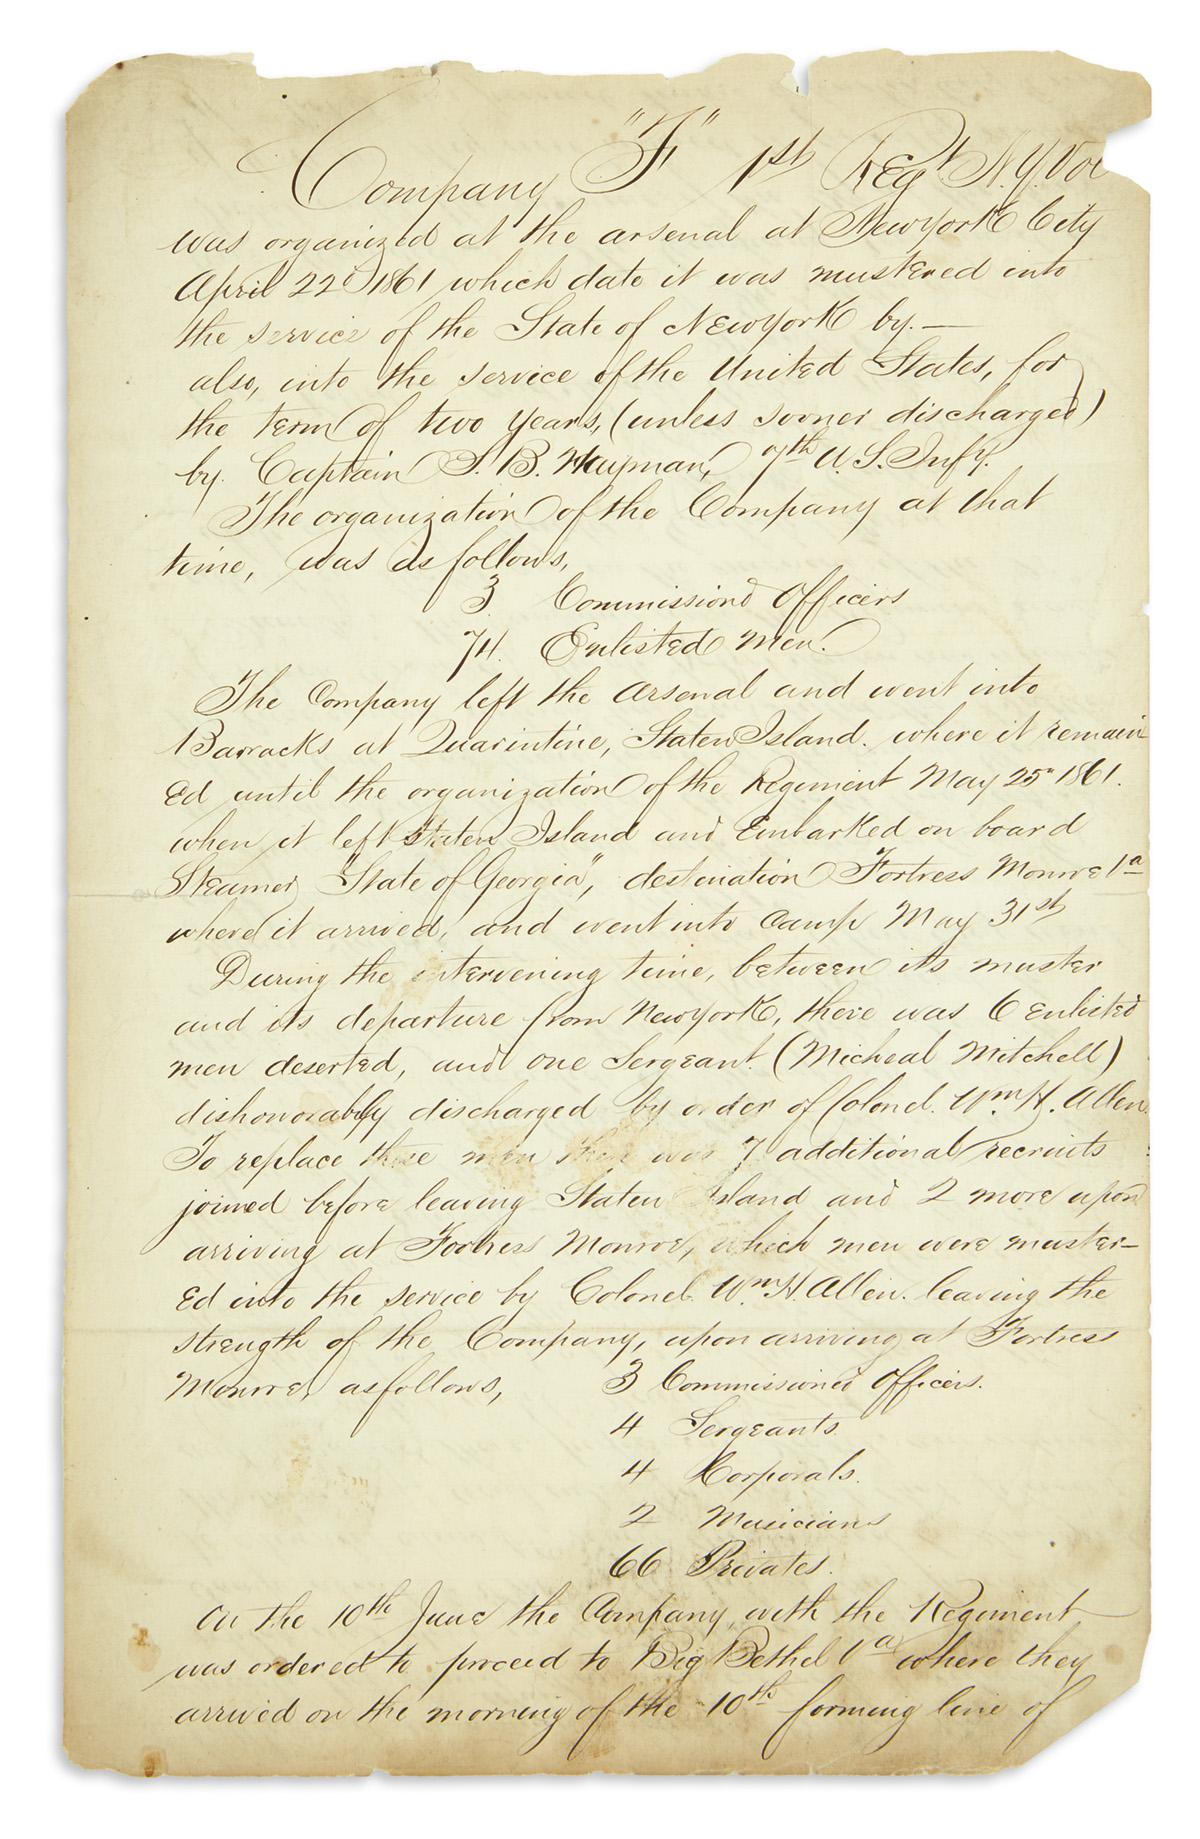 (CIVIL-WAR--NEW-YORK)-Manuscript-histories-of-two-companies-